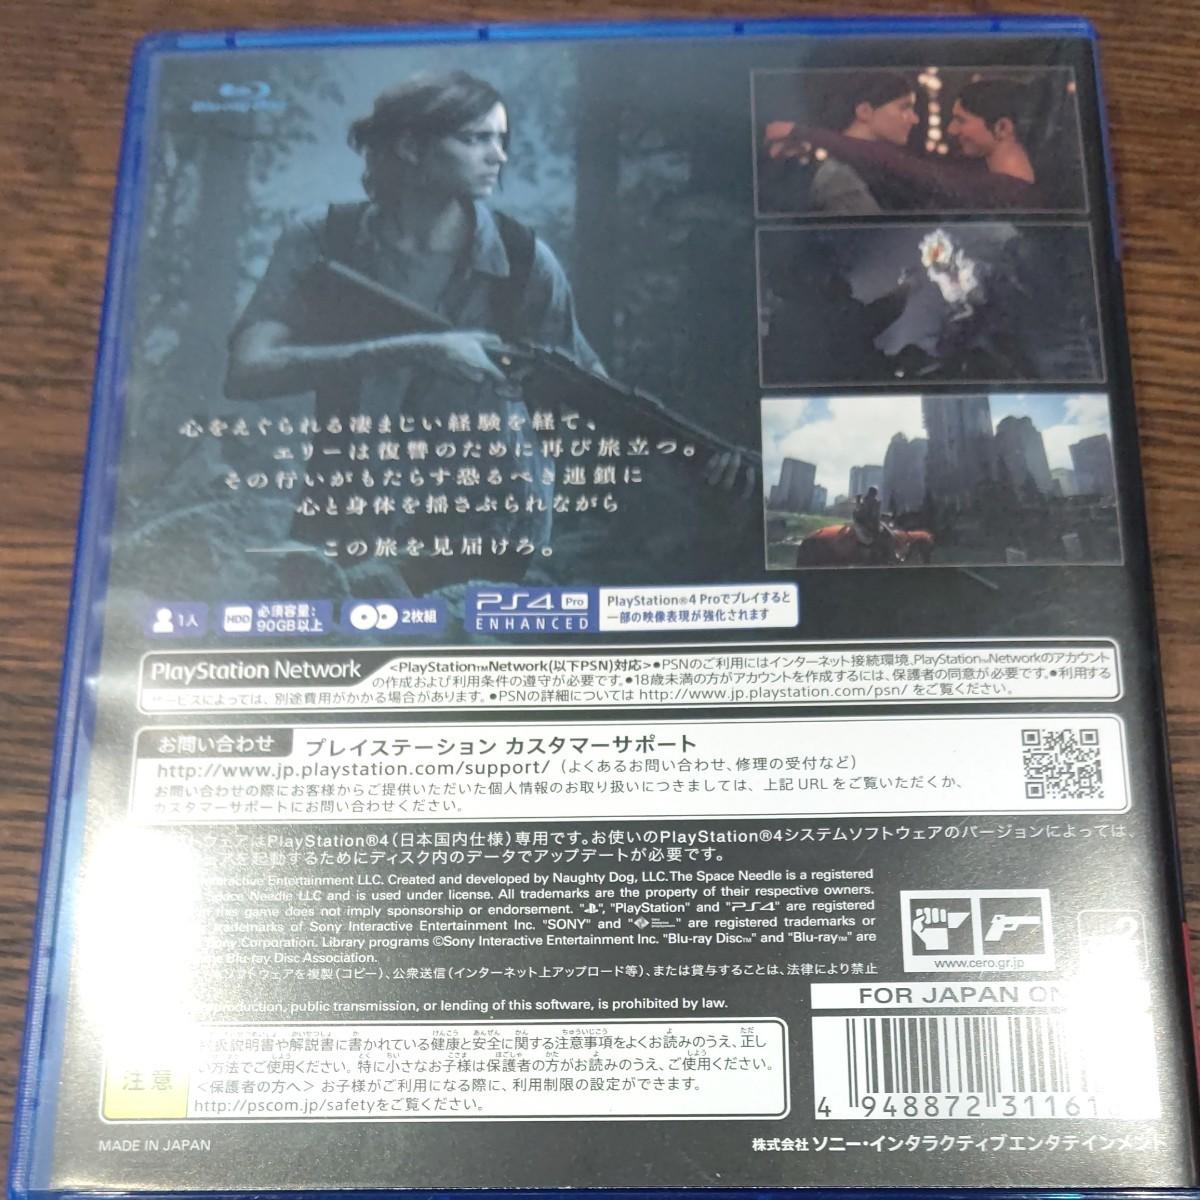 PS4 ラスト・オブ・アス2 The Last of Us Part Ⅱ